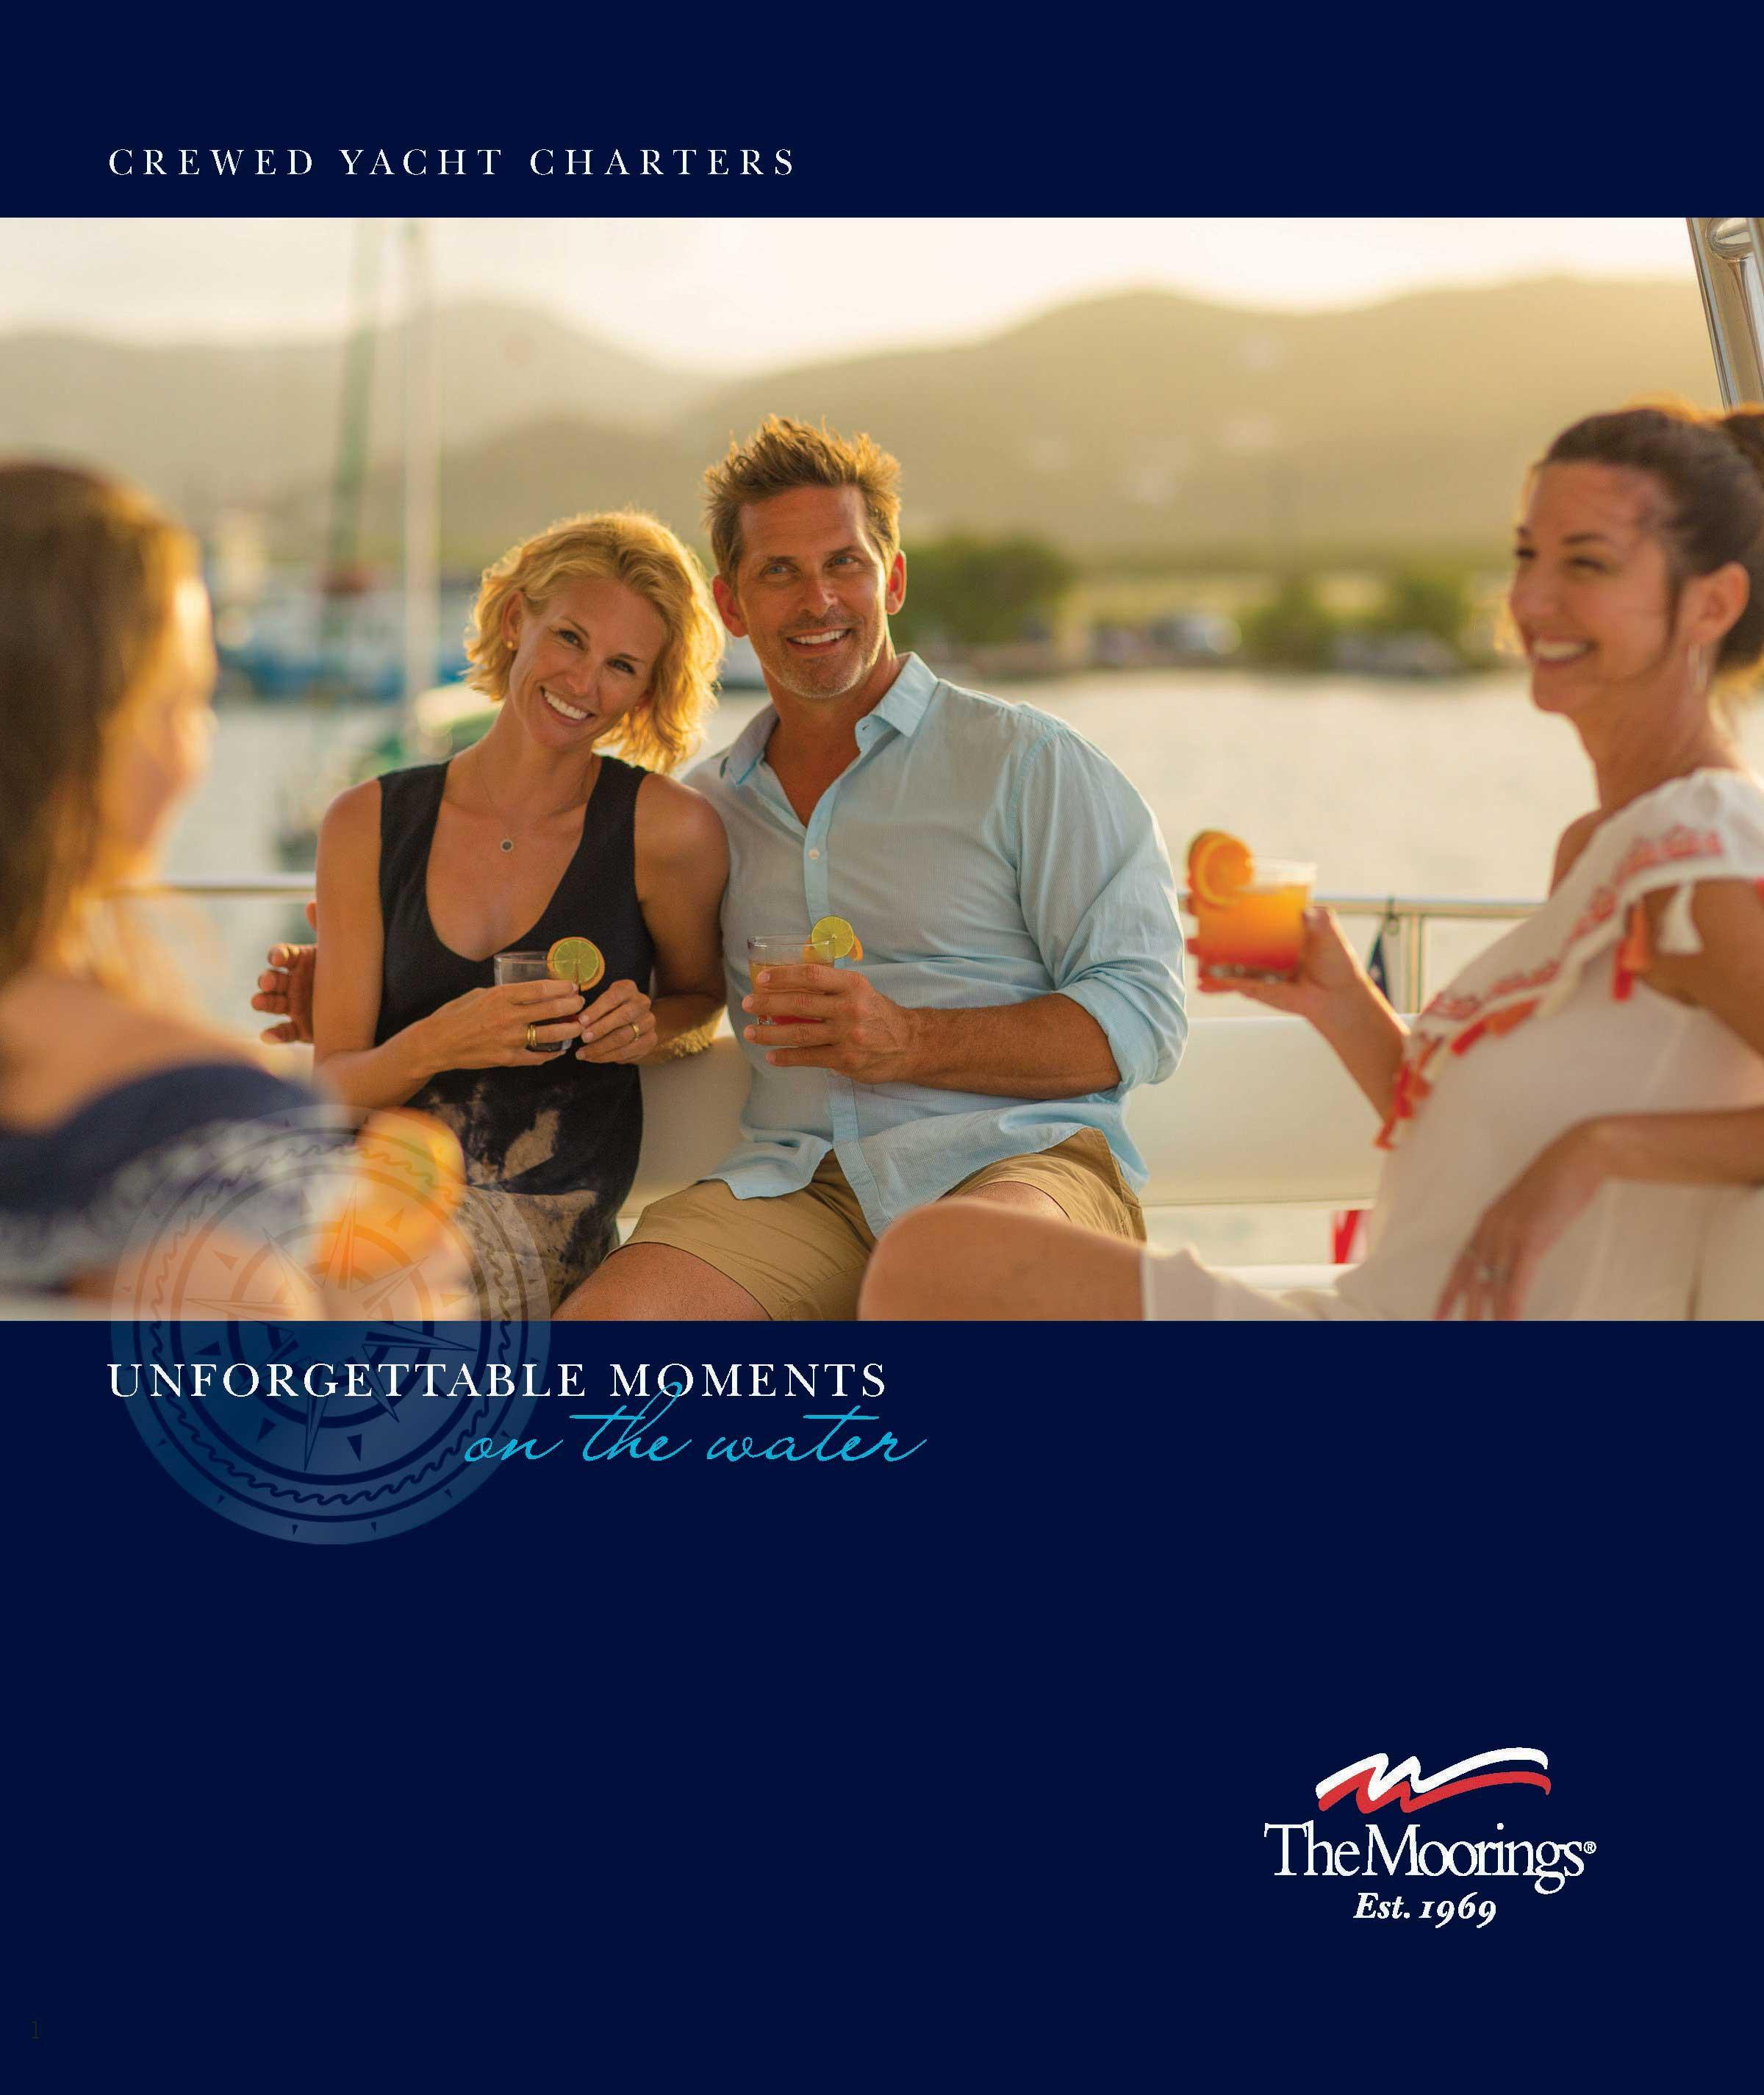 crewed yacht charter brochure